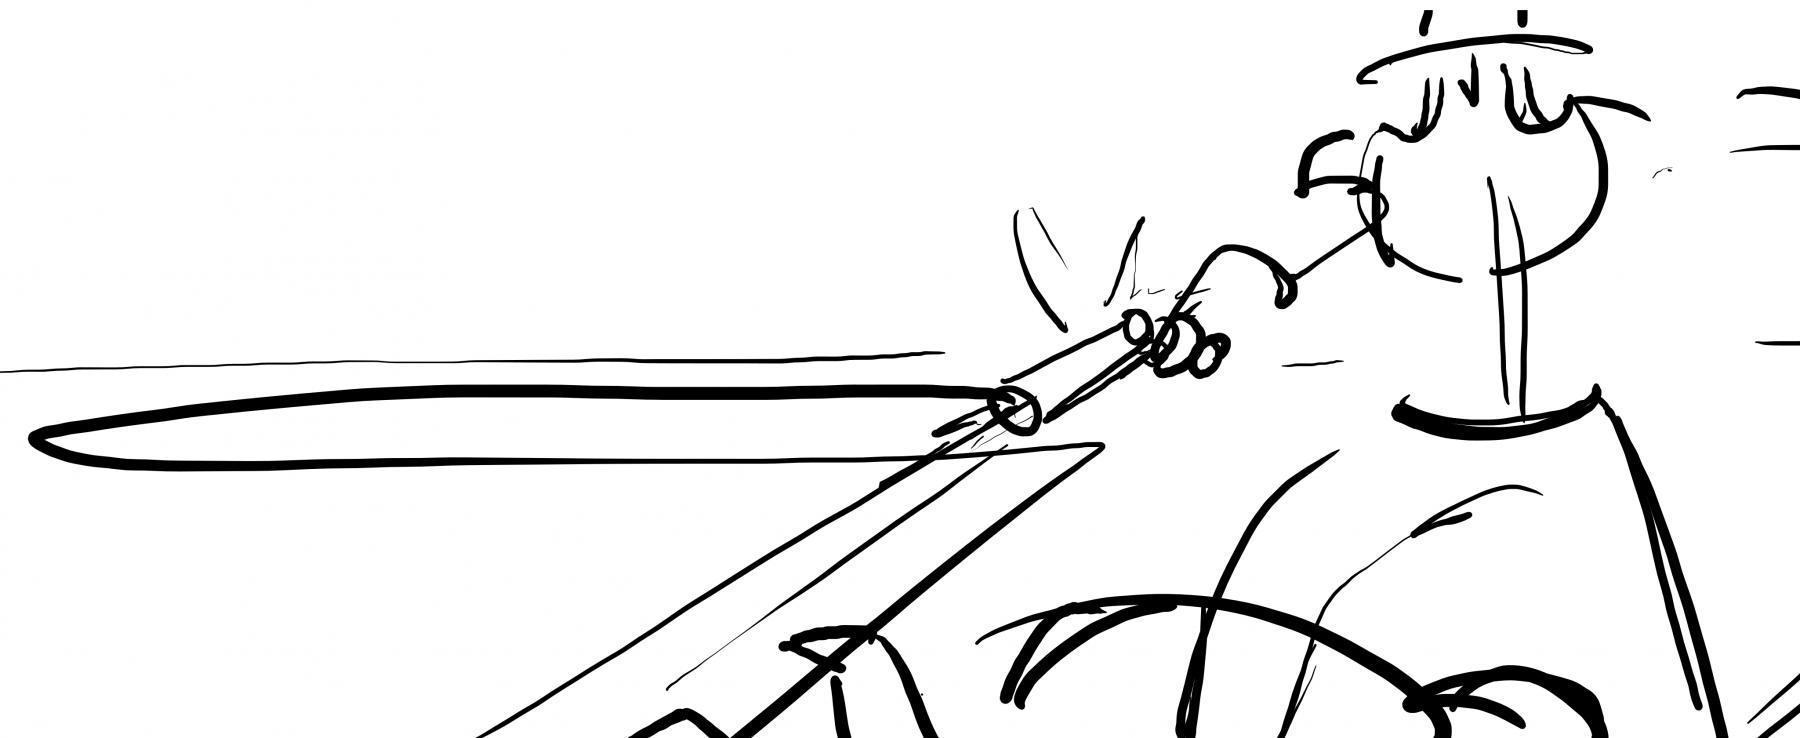 Nut-Thumbnail-Rough-Board00260